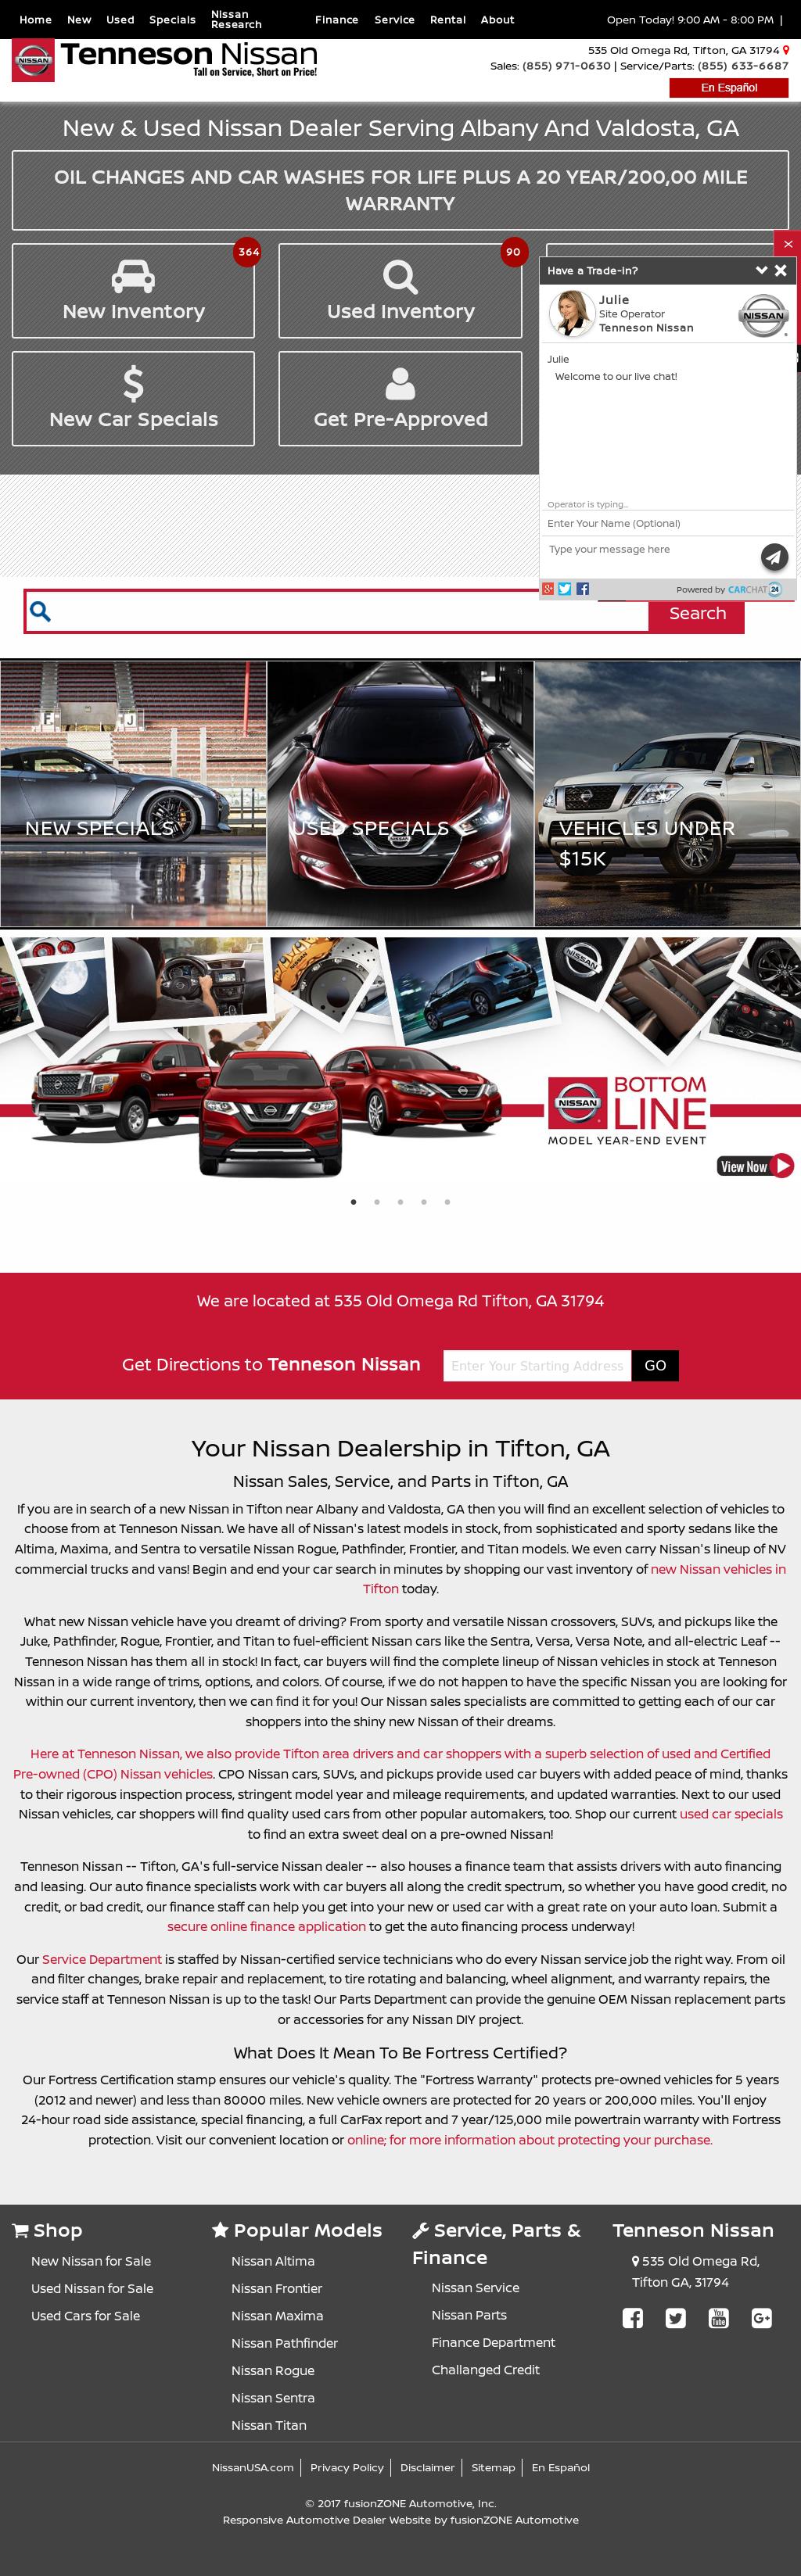 Tenneson Nissan Website History